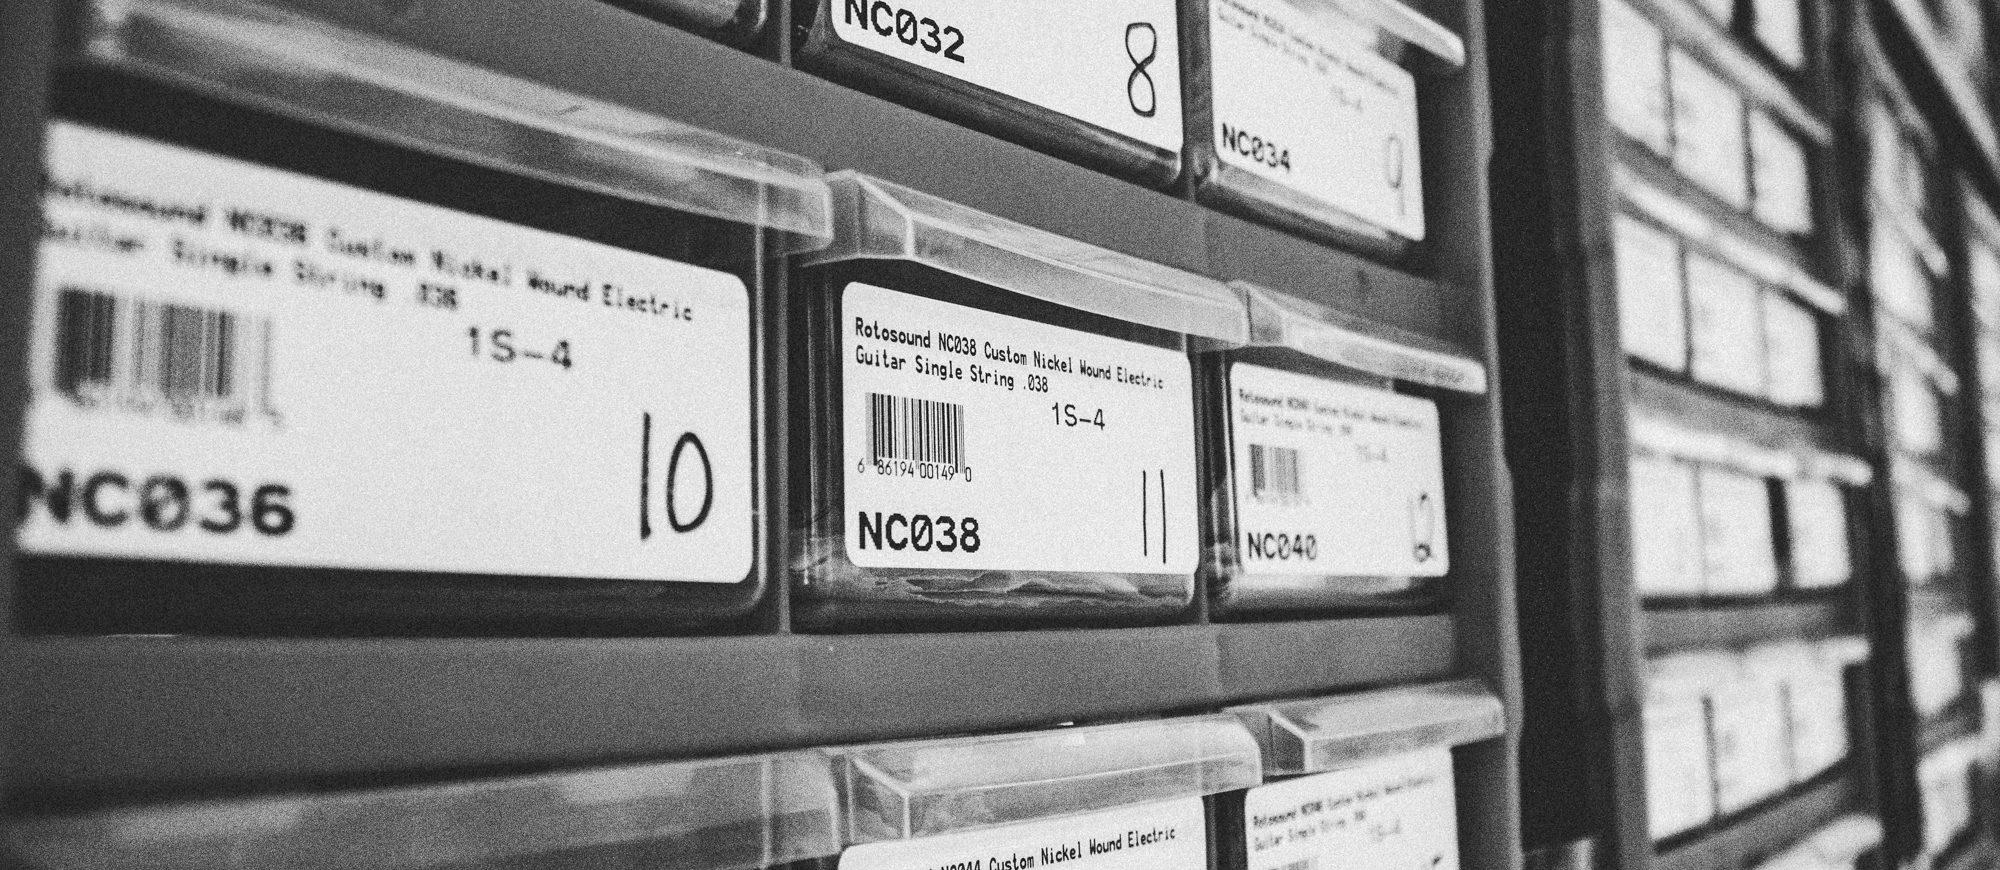 Warehouse racking containing custom gauge single strings